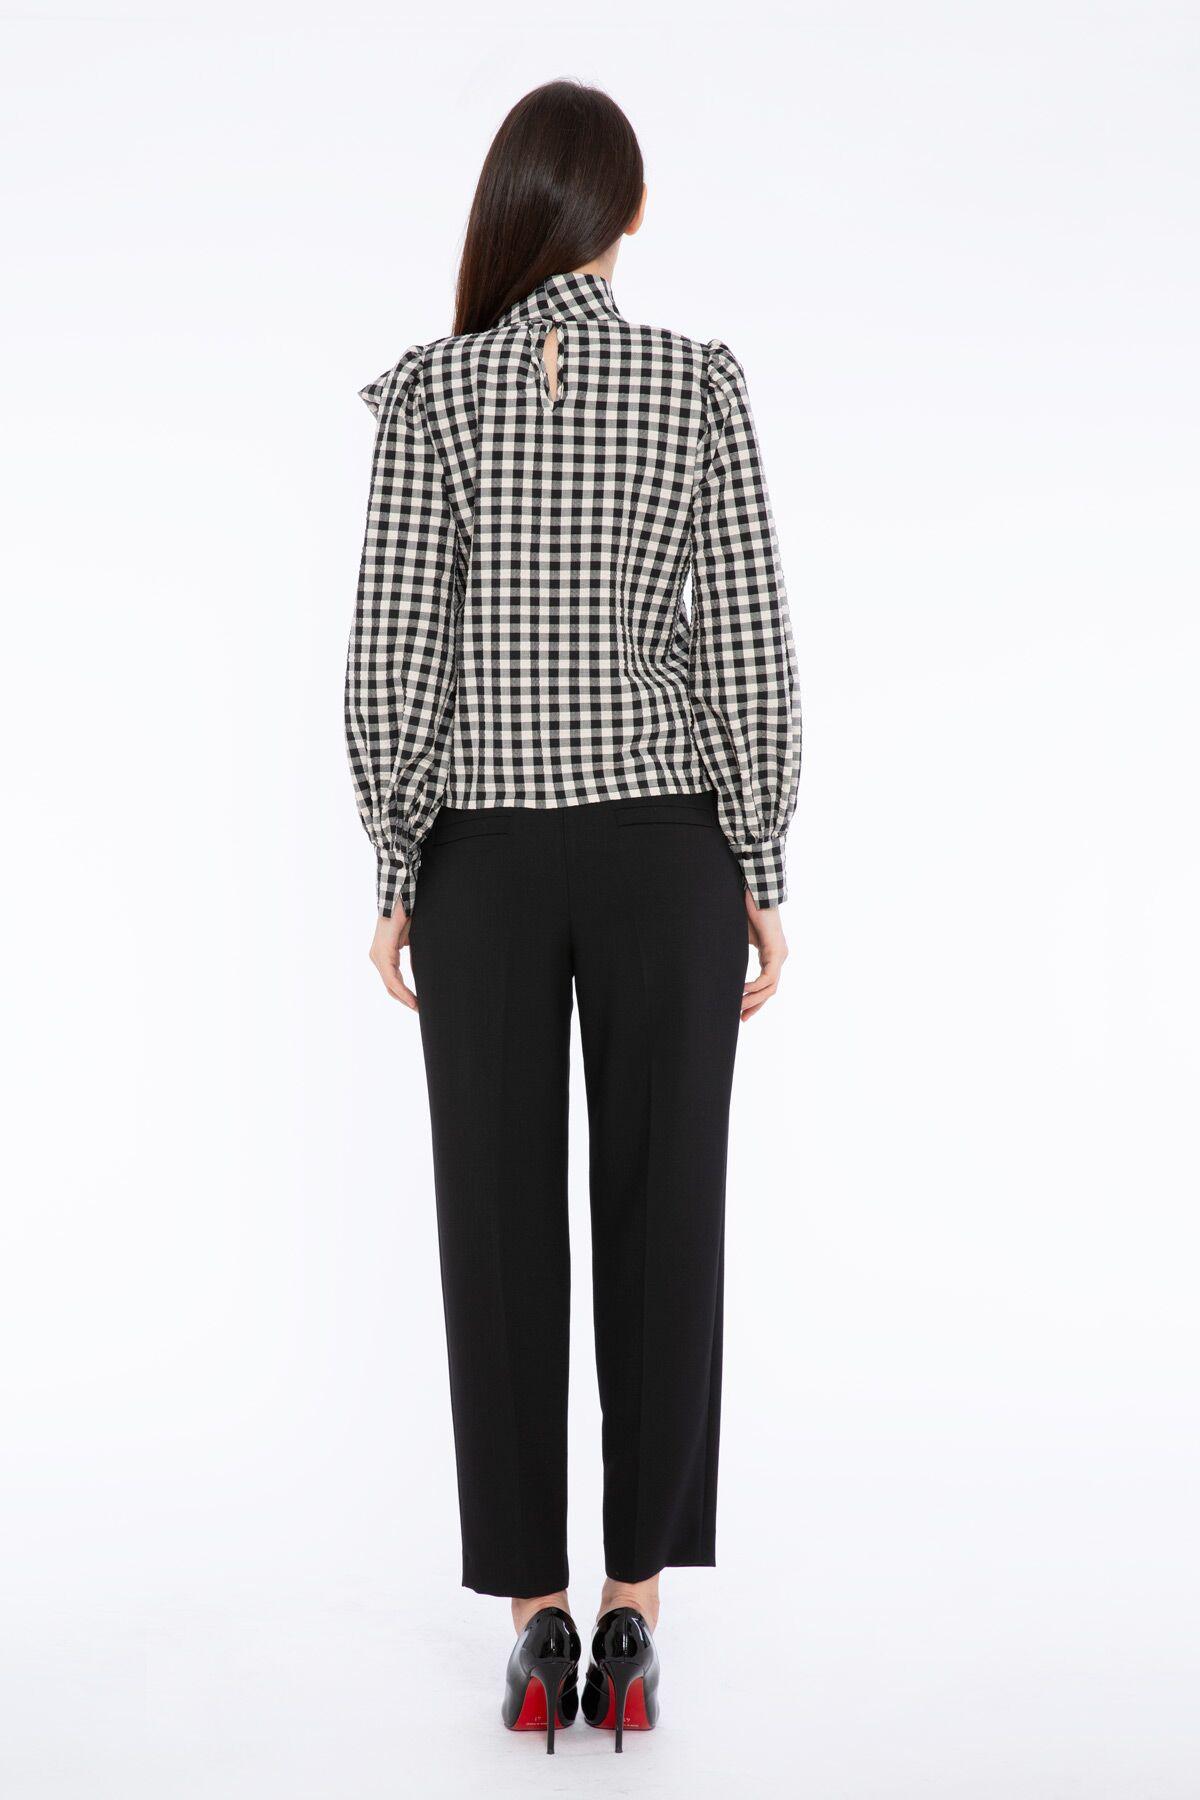 Tie Collar Plaid Pattern Long Sleeve Blouse